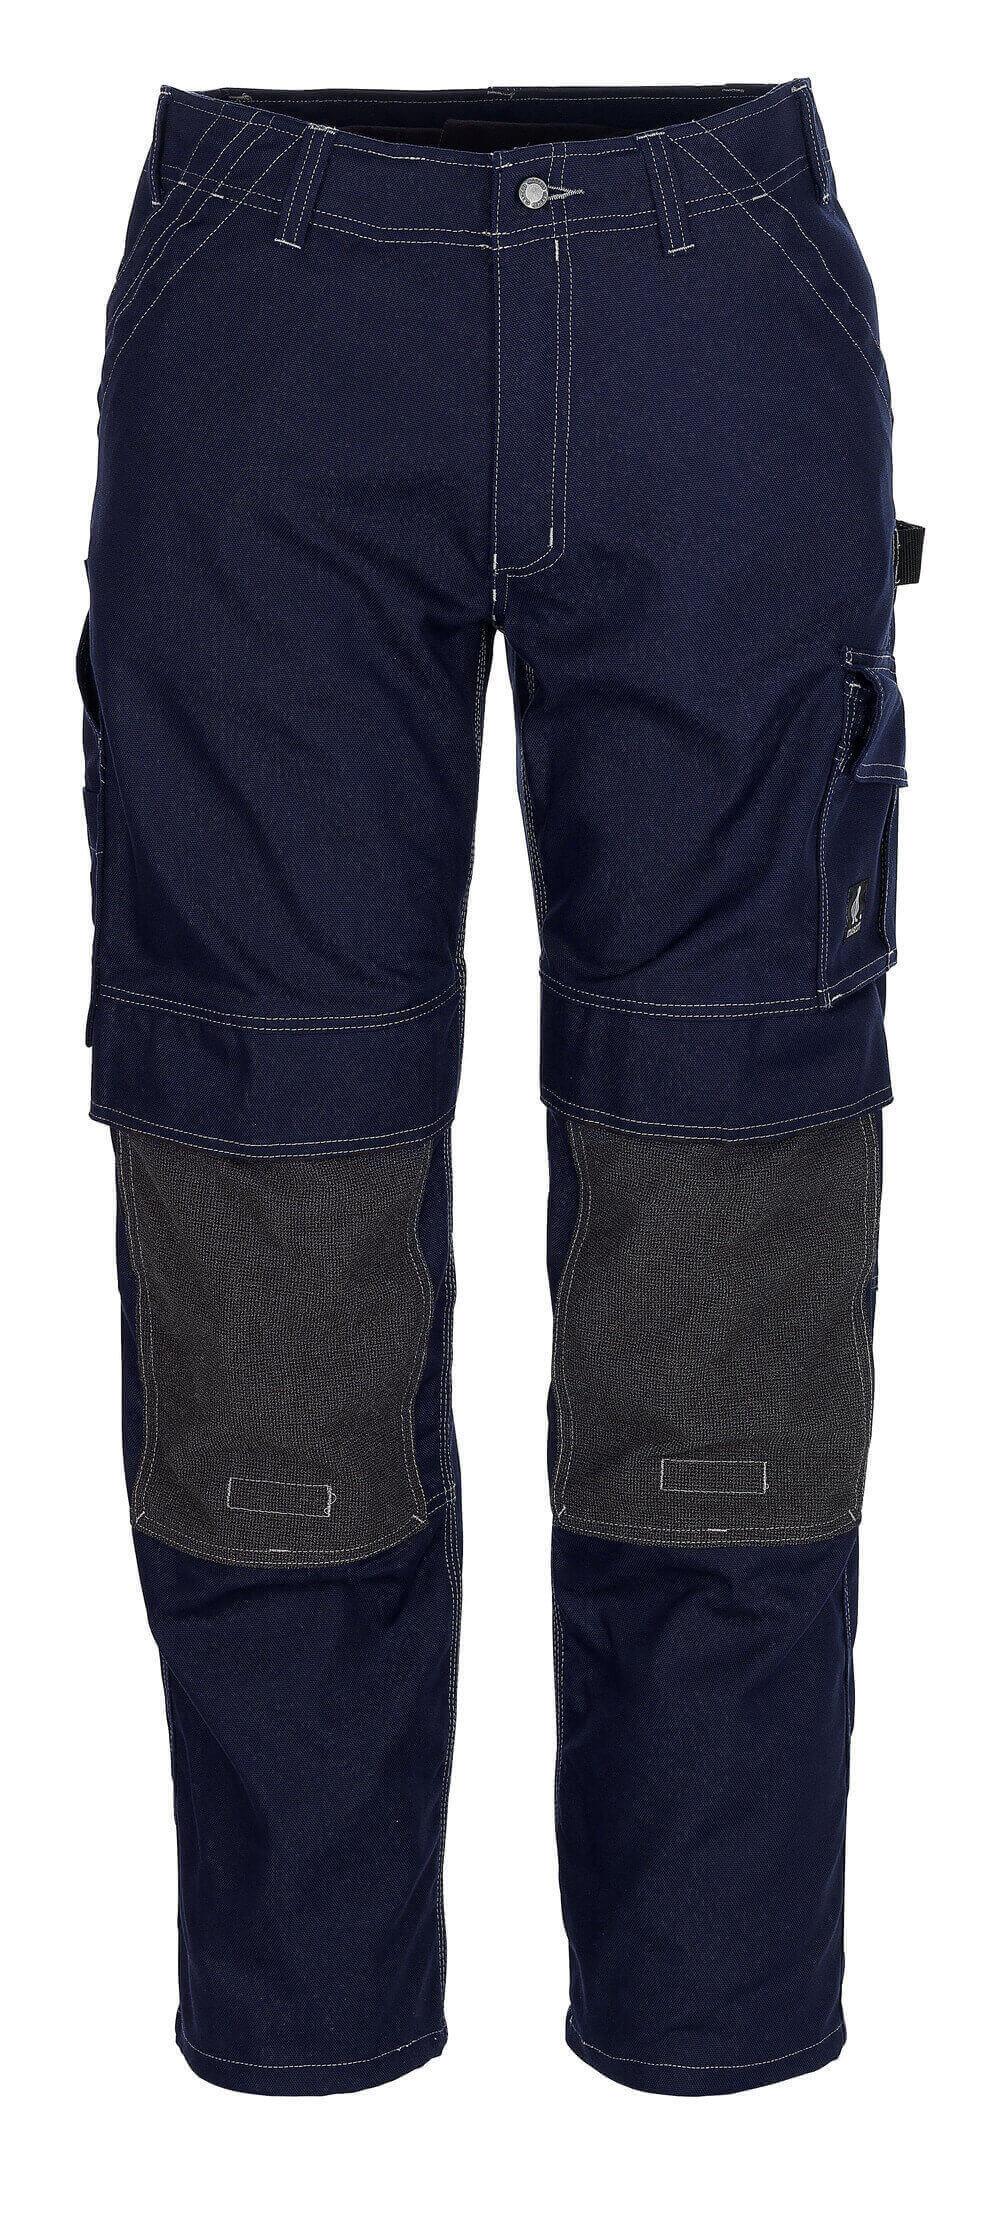 05079-010-01 Pants with kneepad pockets - navy